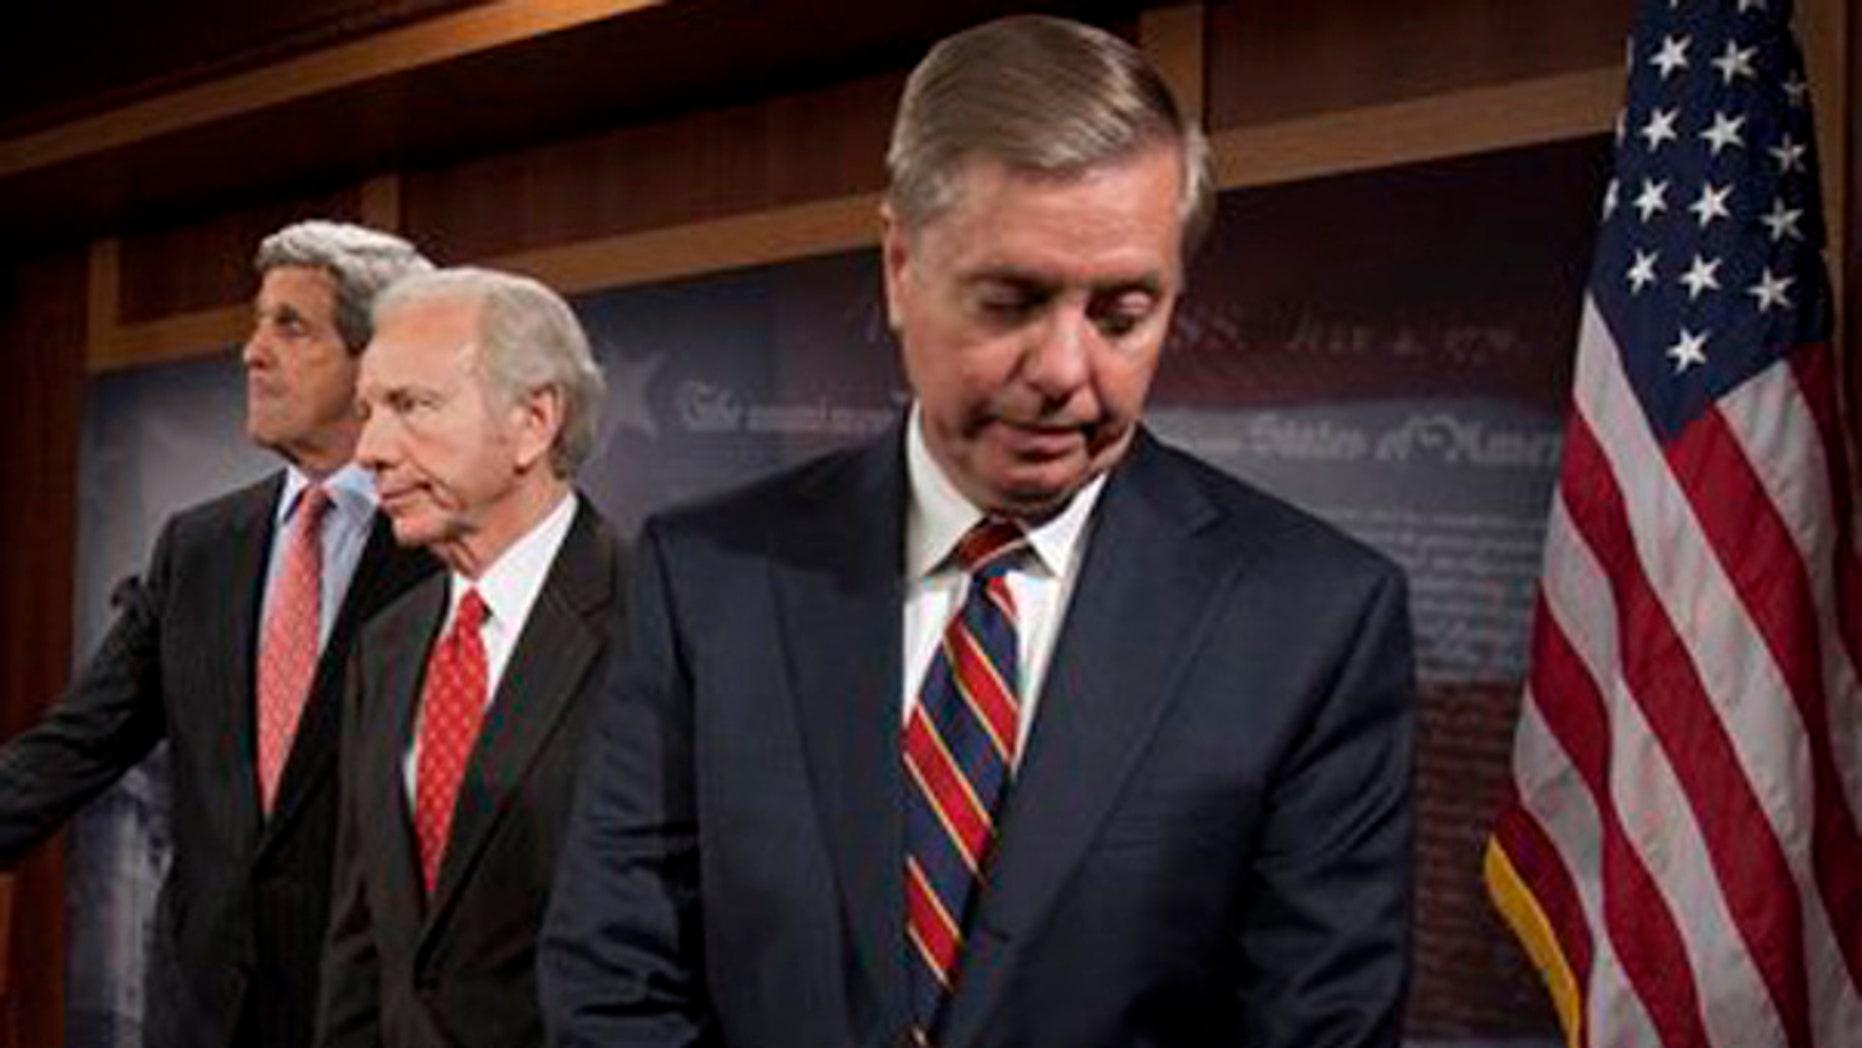 Sen. John Kerry, D-Mass., Sen. Joseph Lieberman, I-Conn., and Sen. Lindsey Graham, R-S.C. take part in a news conference on Capitol Hill in Washington, Wednesday, Nov. 4, 2009 (AP)